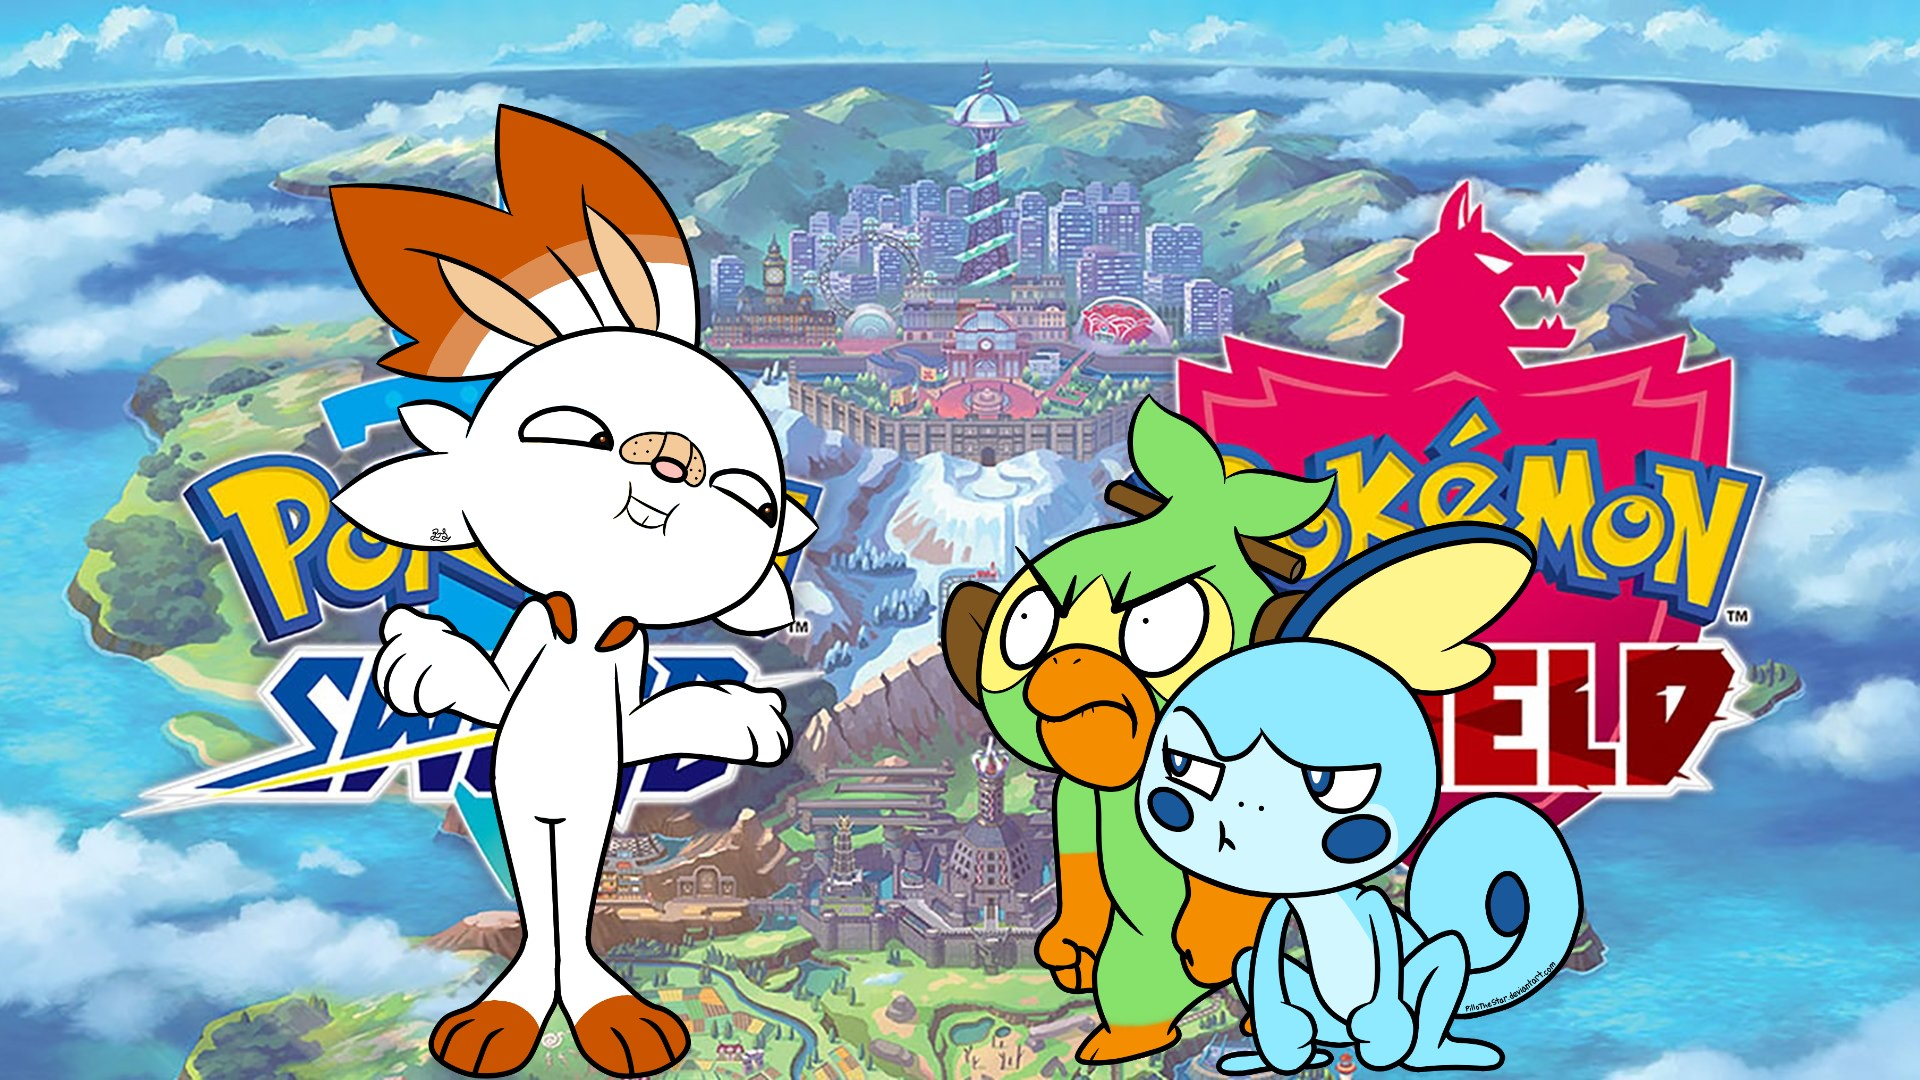 Pokémon Spada e Scudo — Storia di una comunicazione tragica (e di un paio di bugie) - NintendOn